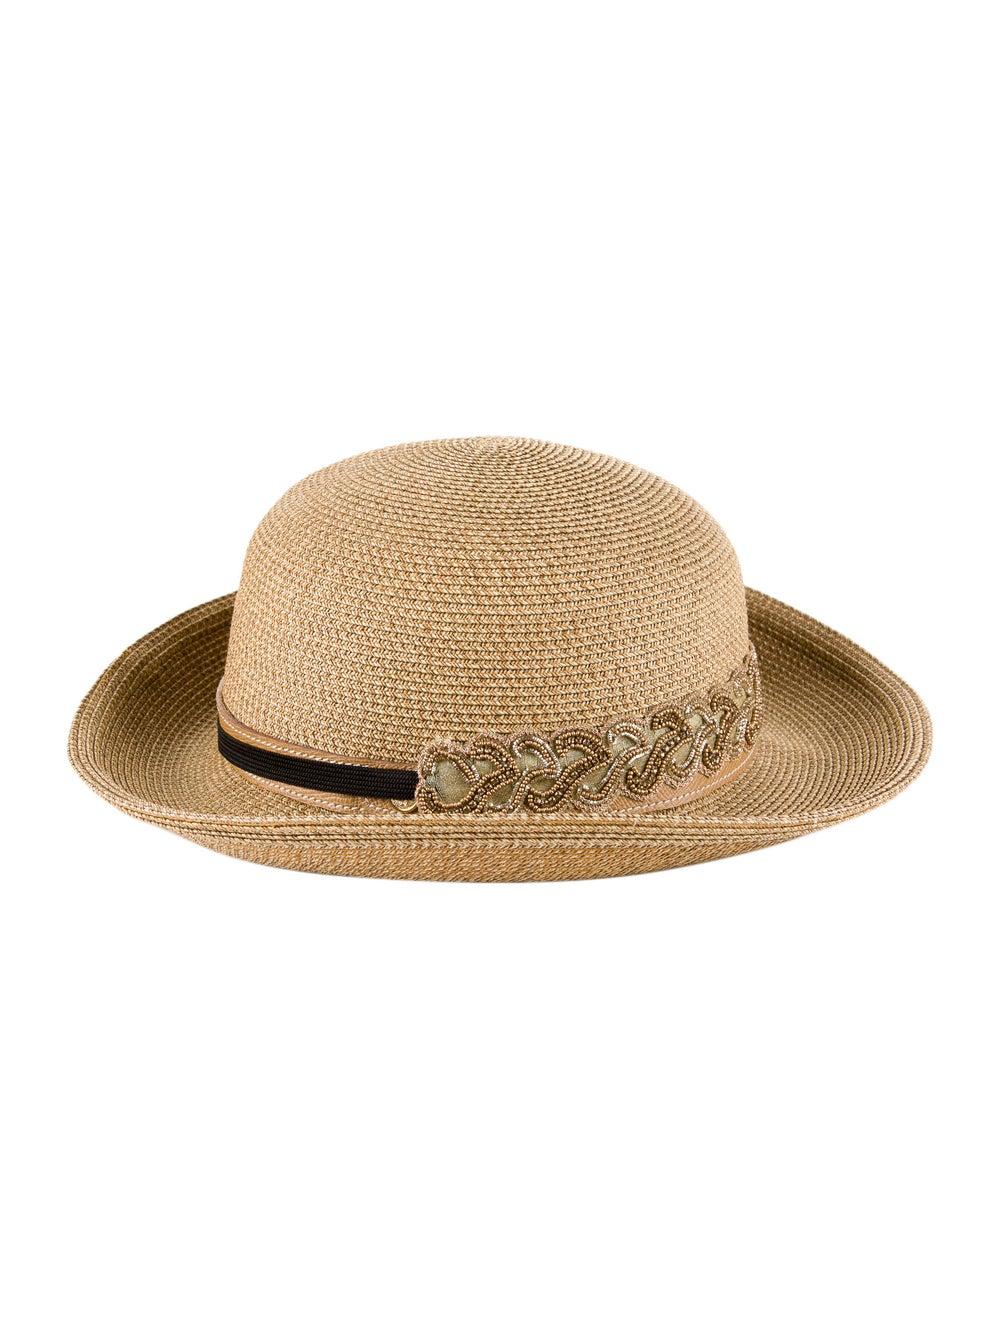 Eric Javits Wide Brim Hat - image 1